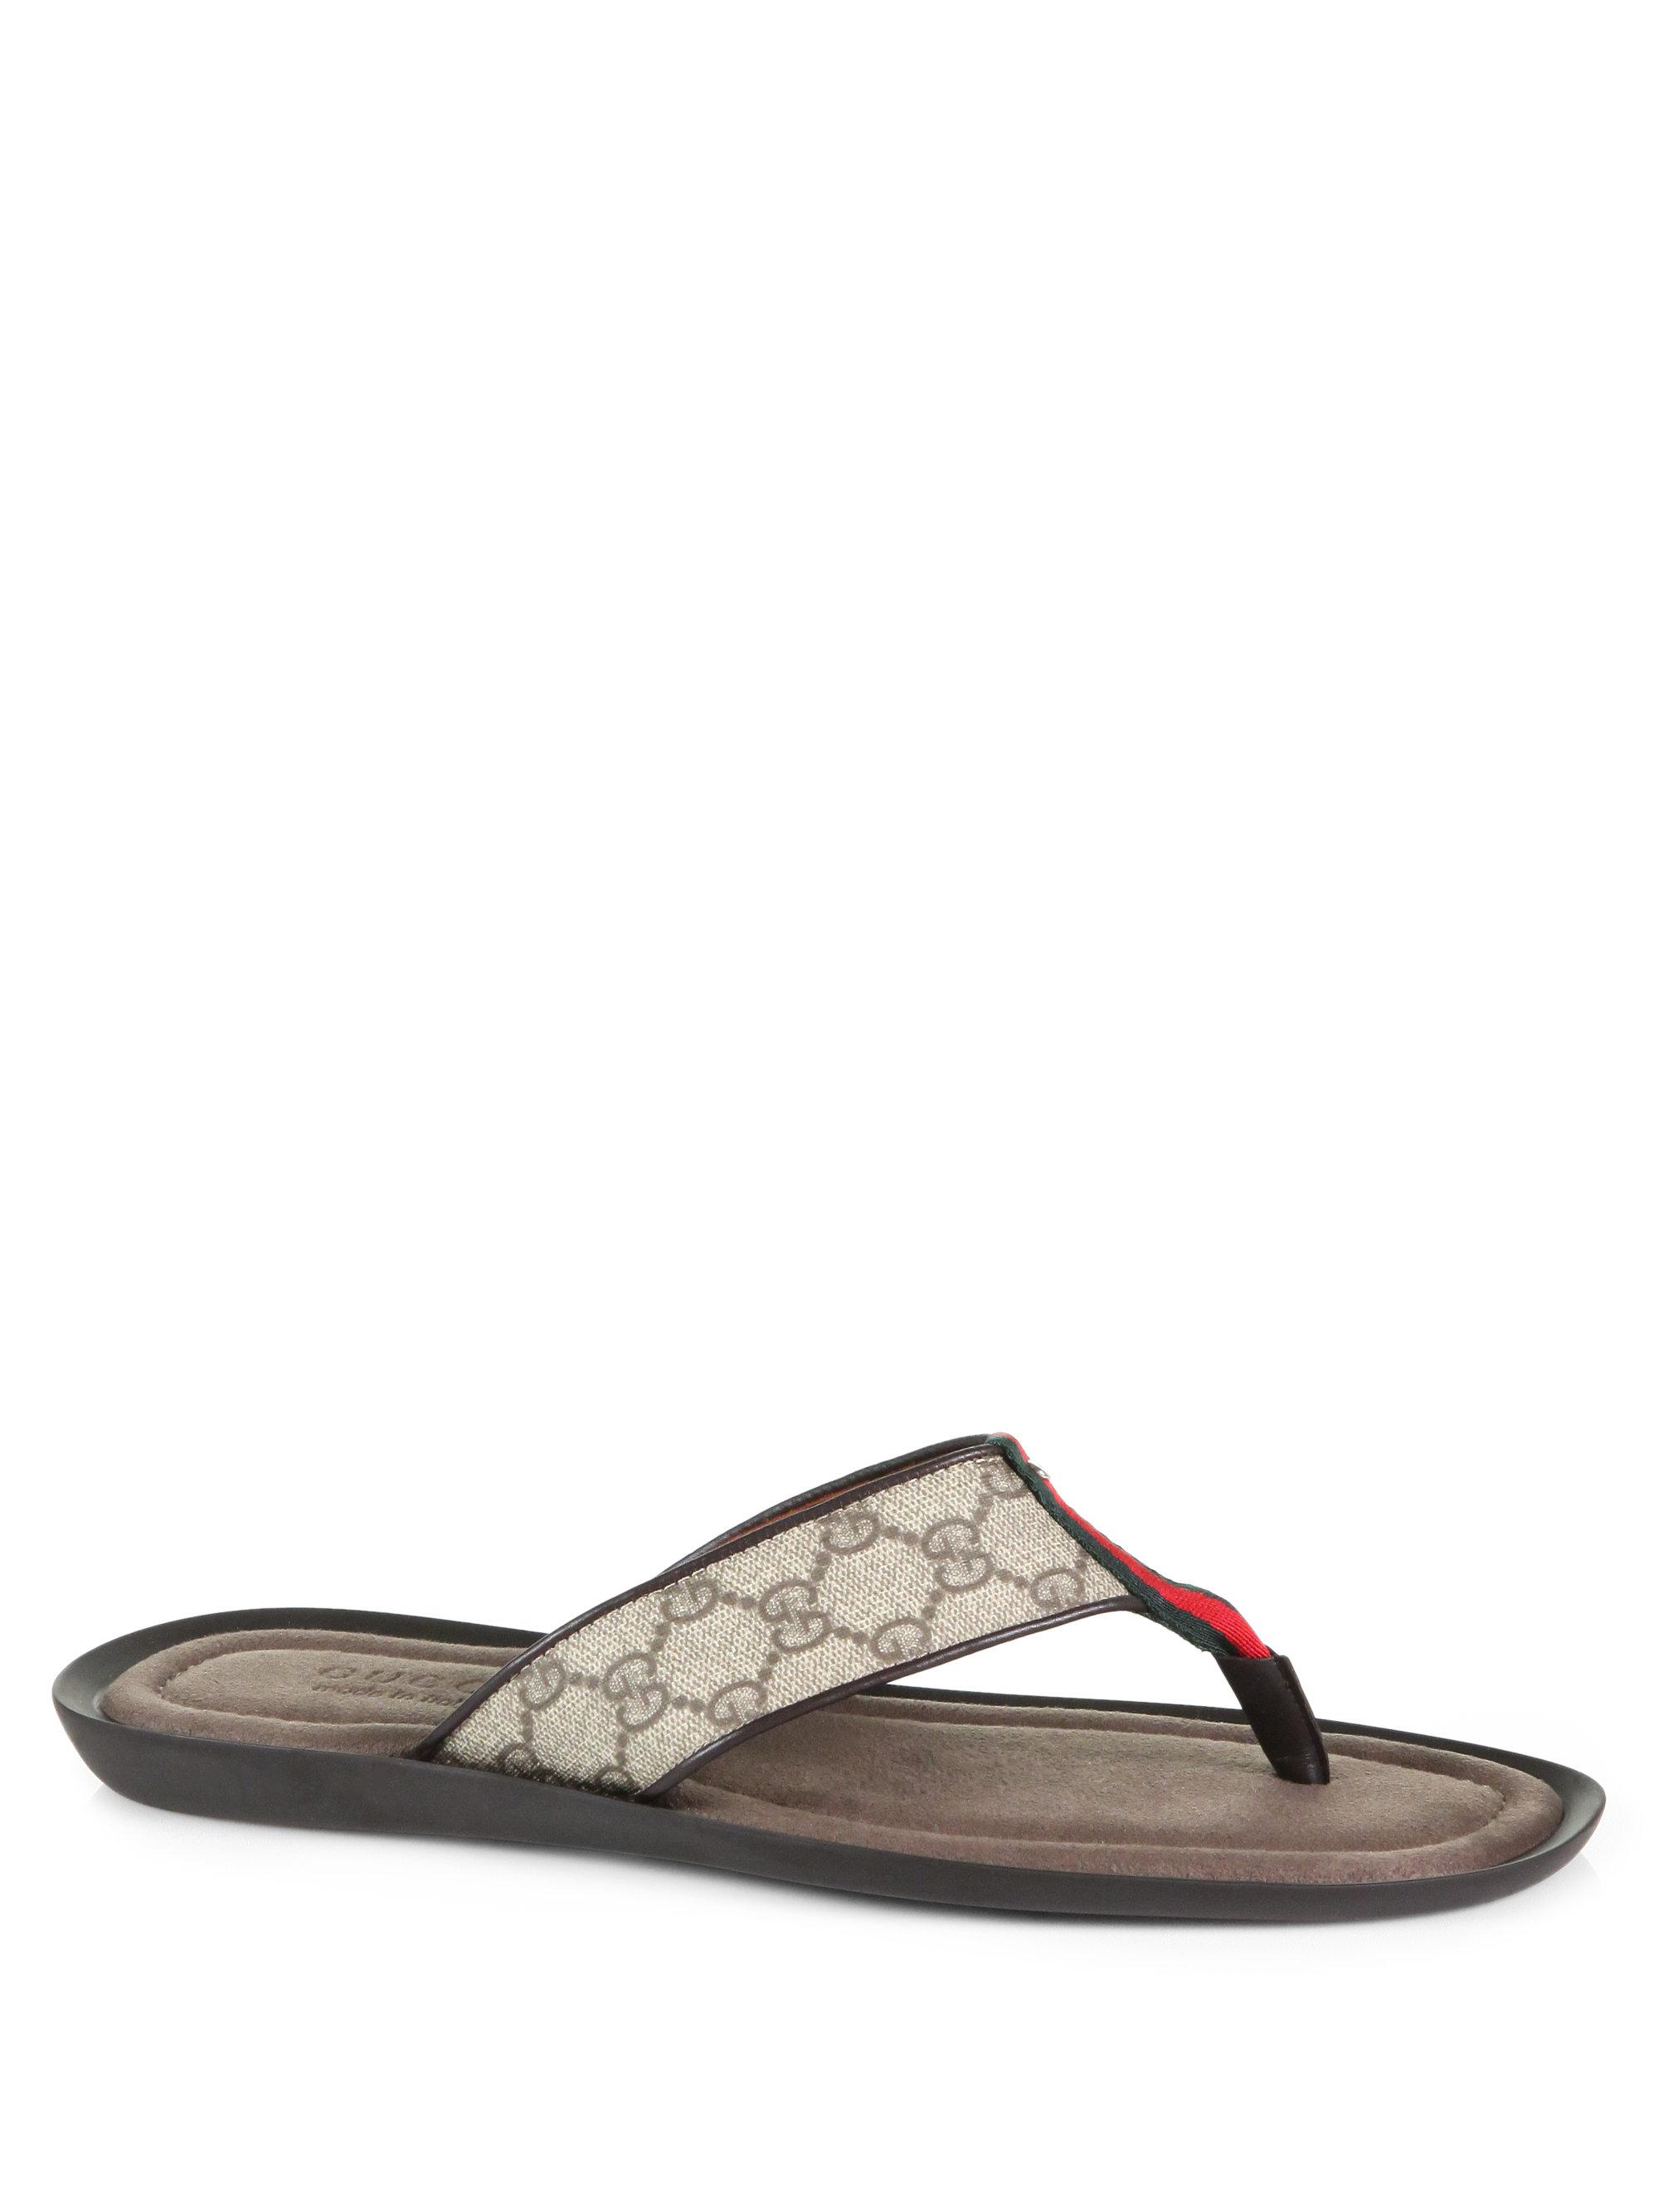 Lyst - Gucci Thong Sandal in Gray for Men 8cc92893851b